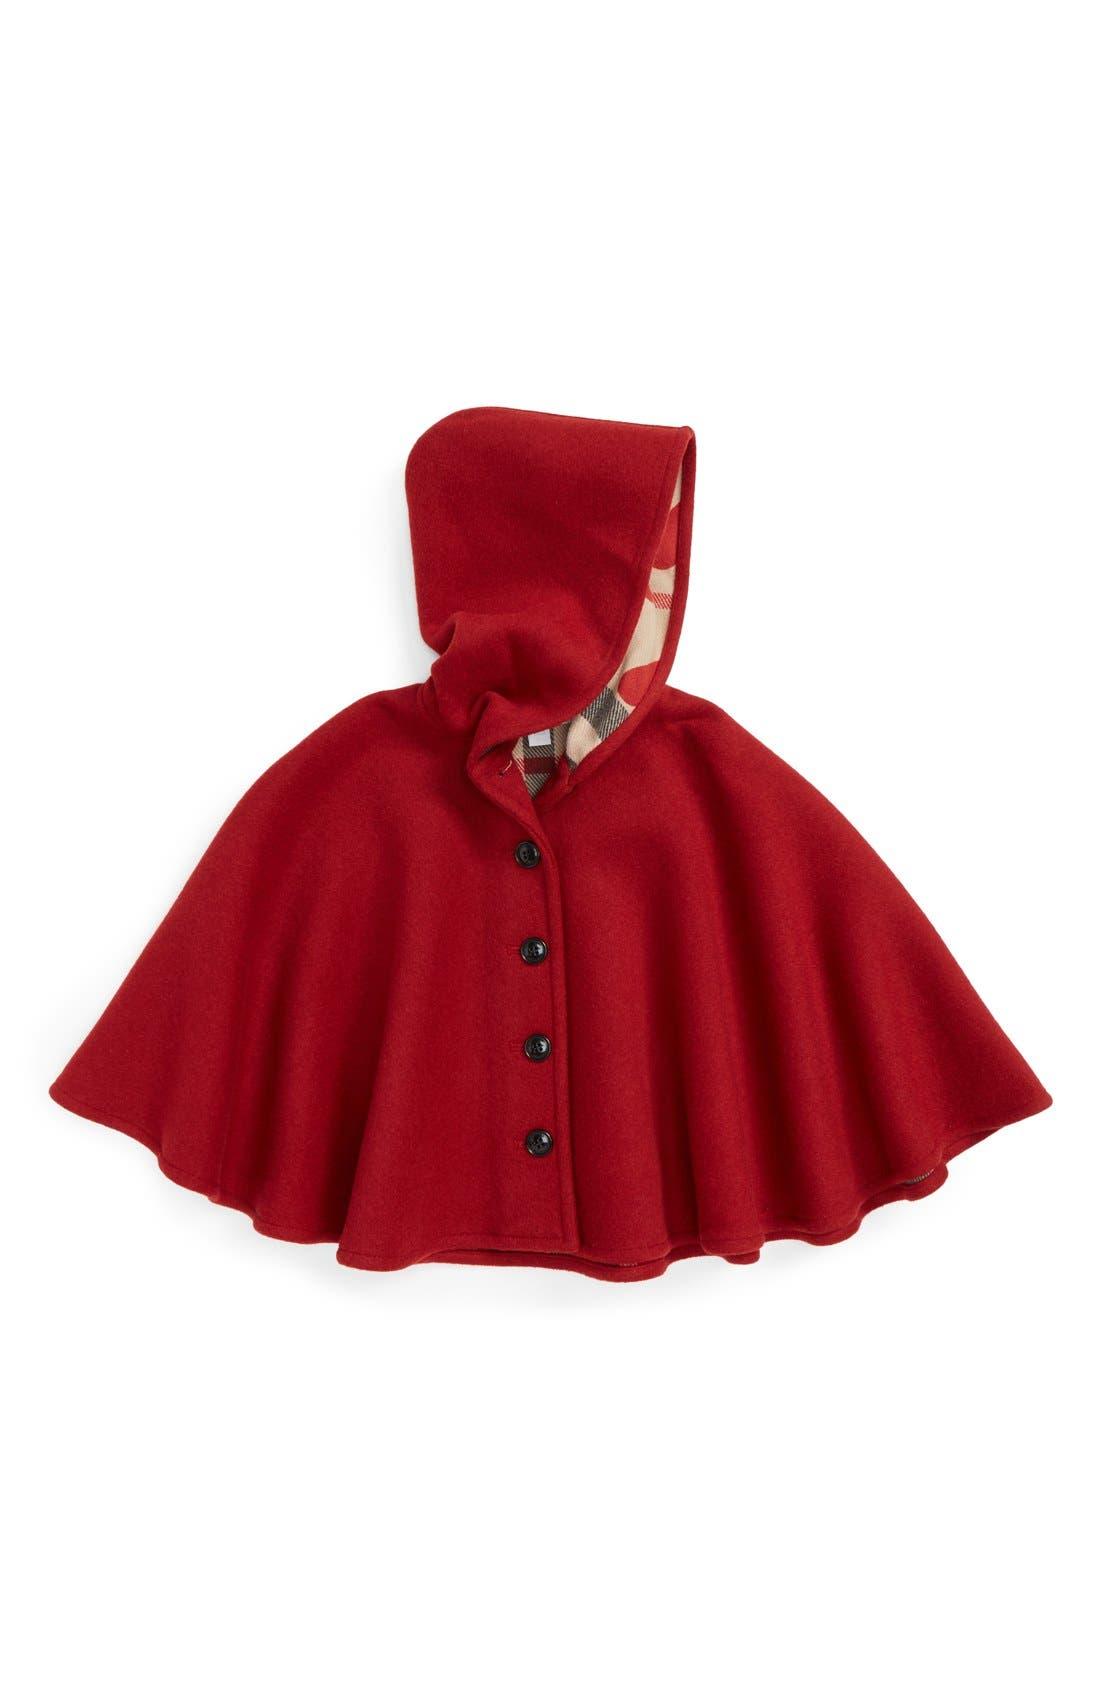 Alternate Image 1 Selected - Burberry 'Rosa' Hooded Wool Cape (Little Girls)